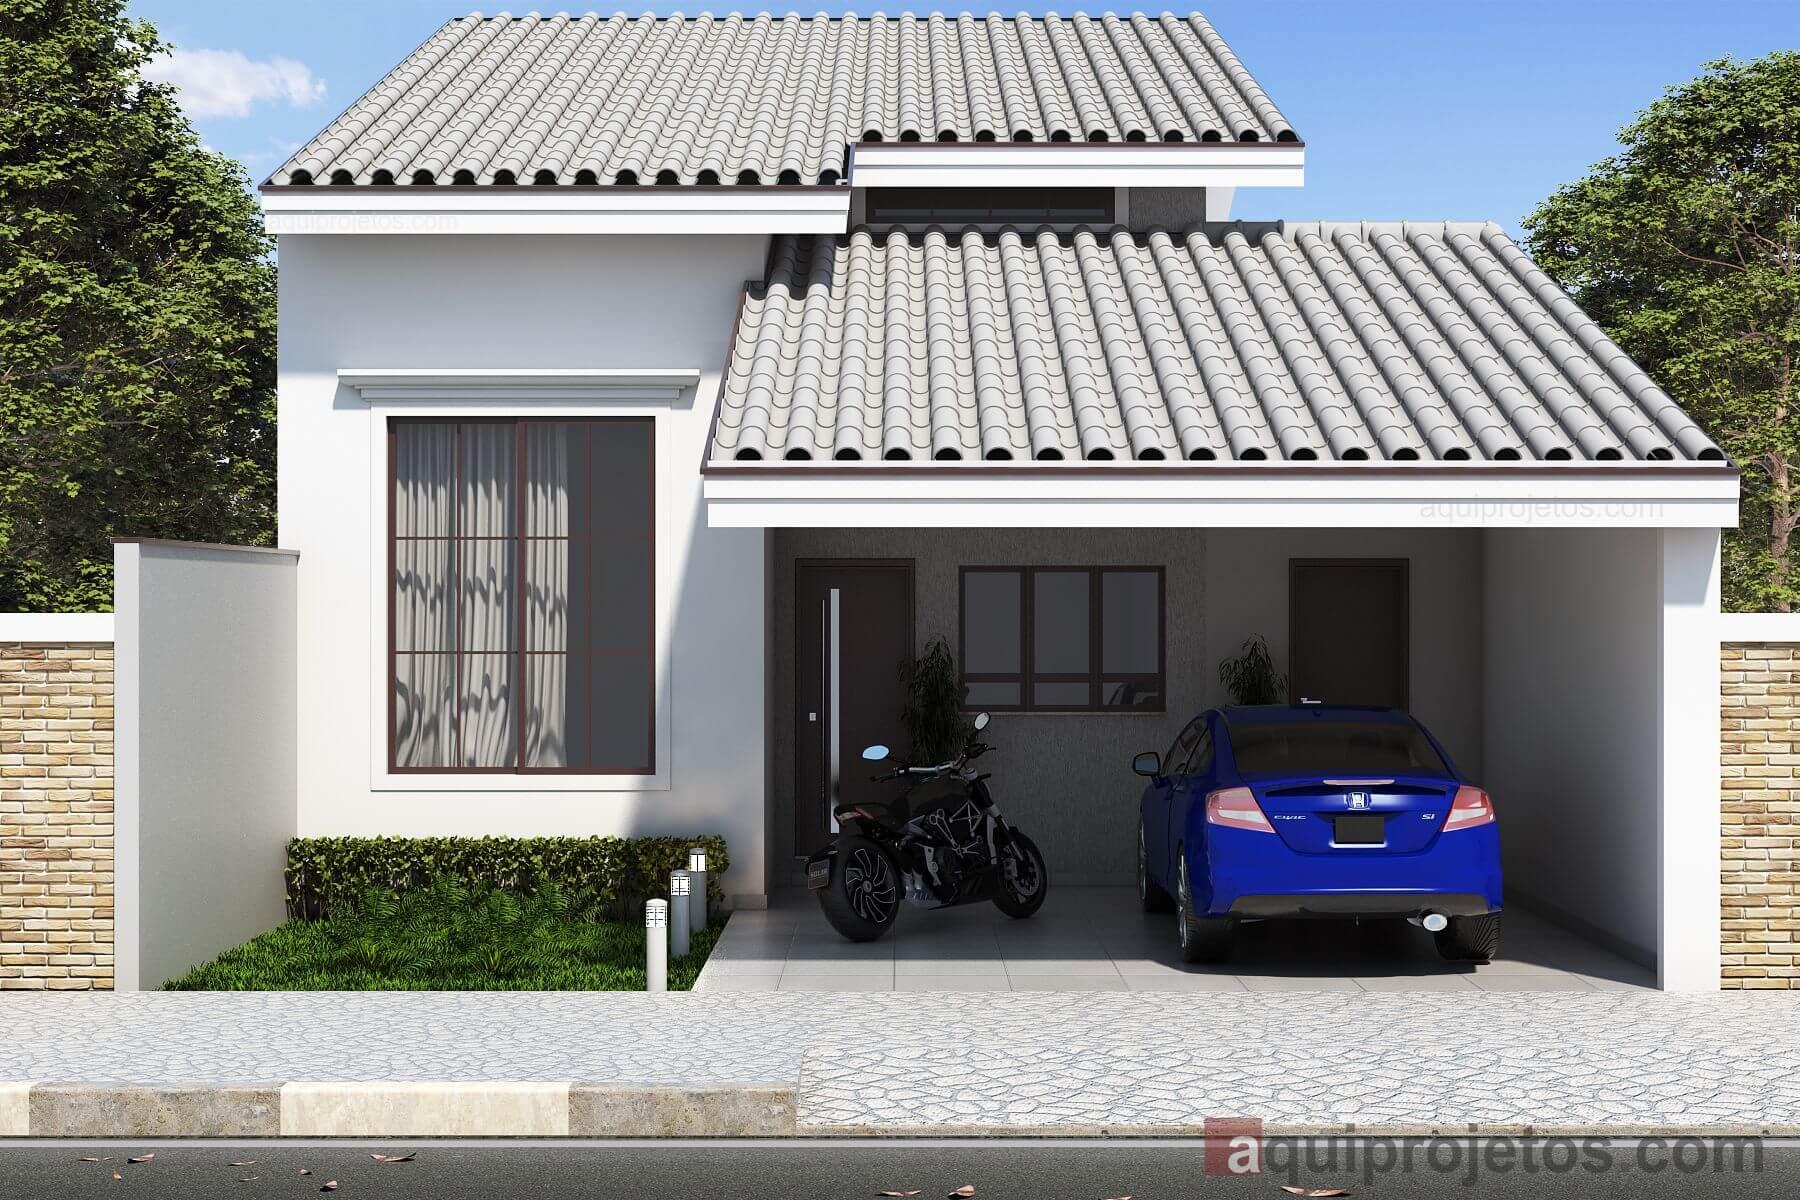 Fachadas de casas modernas - Aquiprojetos